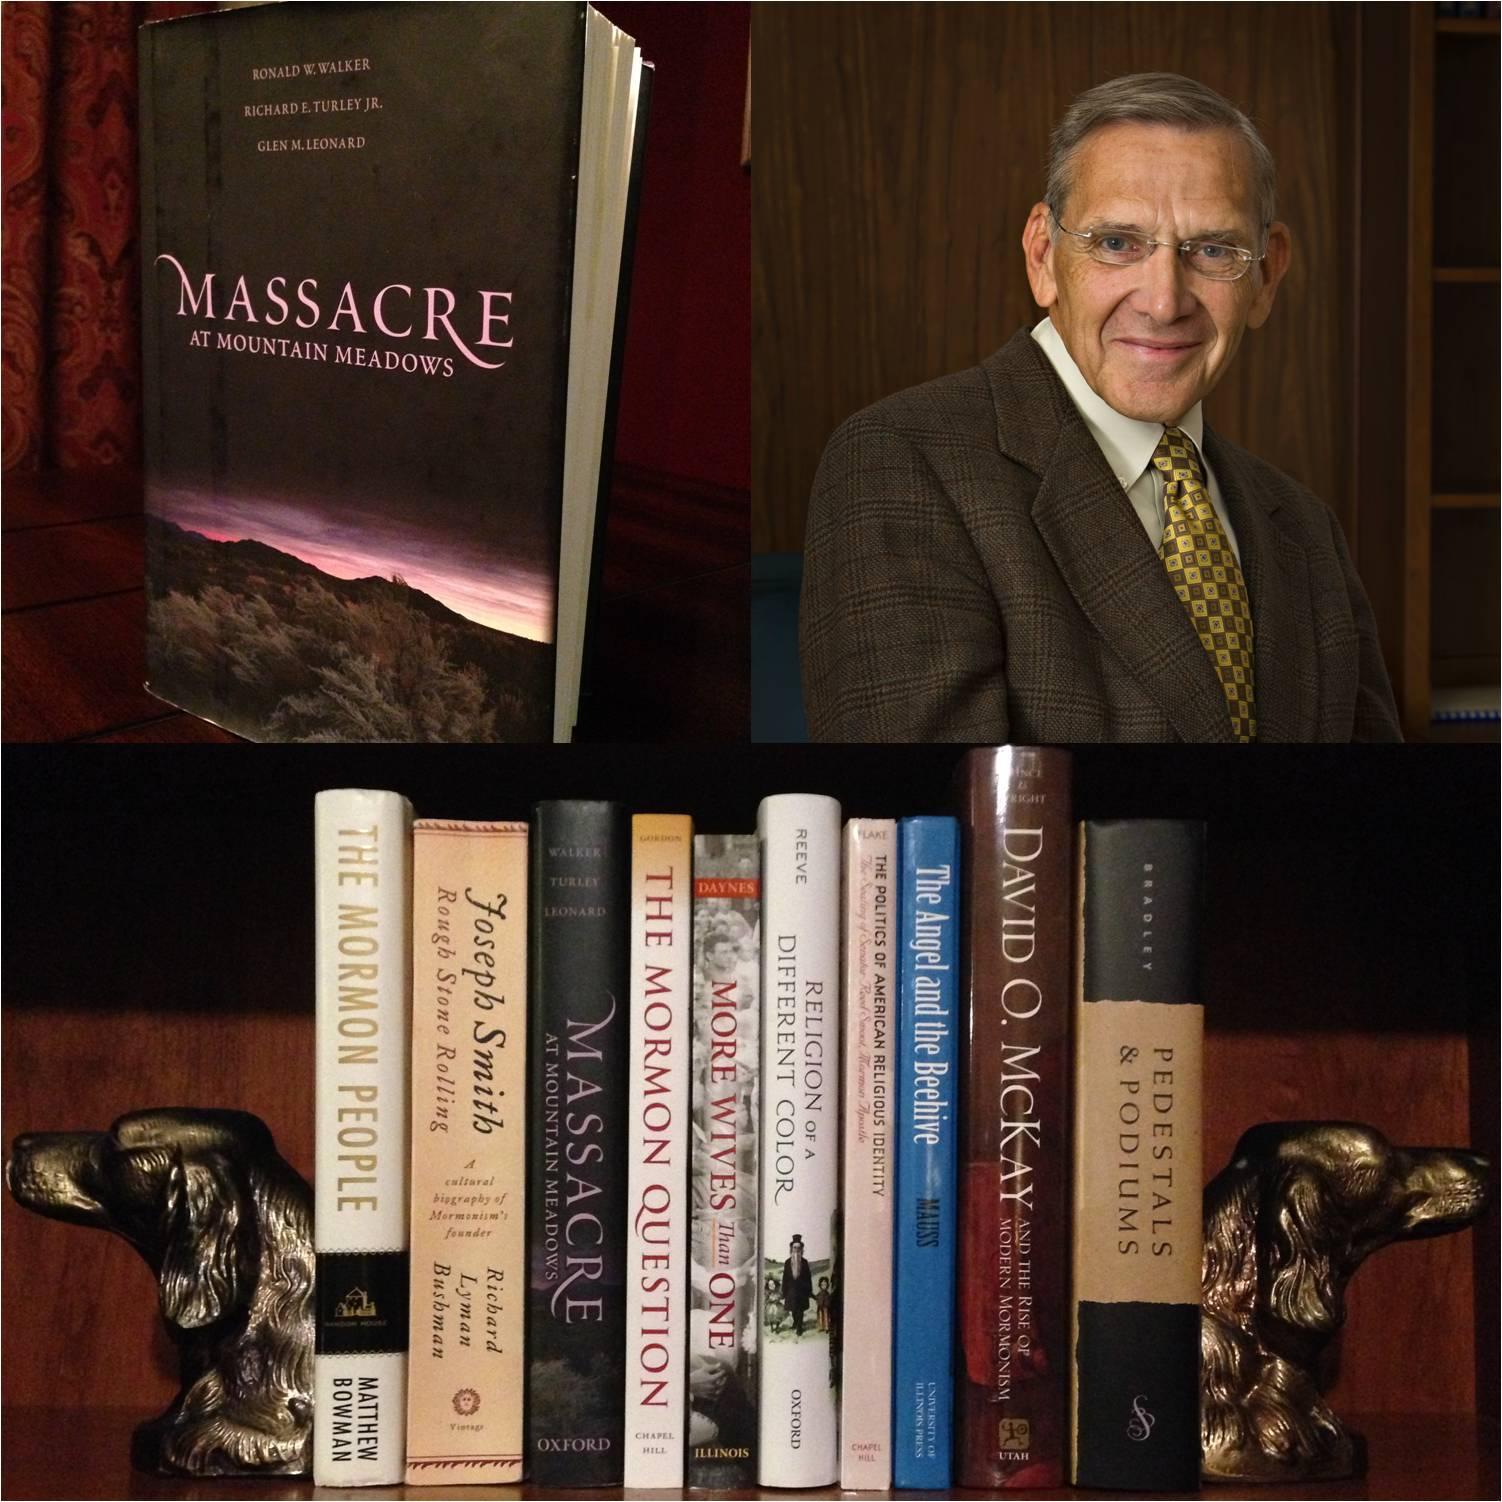 59: Top Ten Books on Mormon History – Massacre at Mountain Meadows